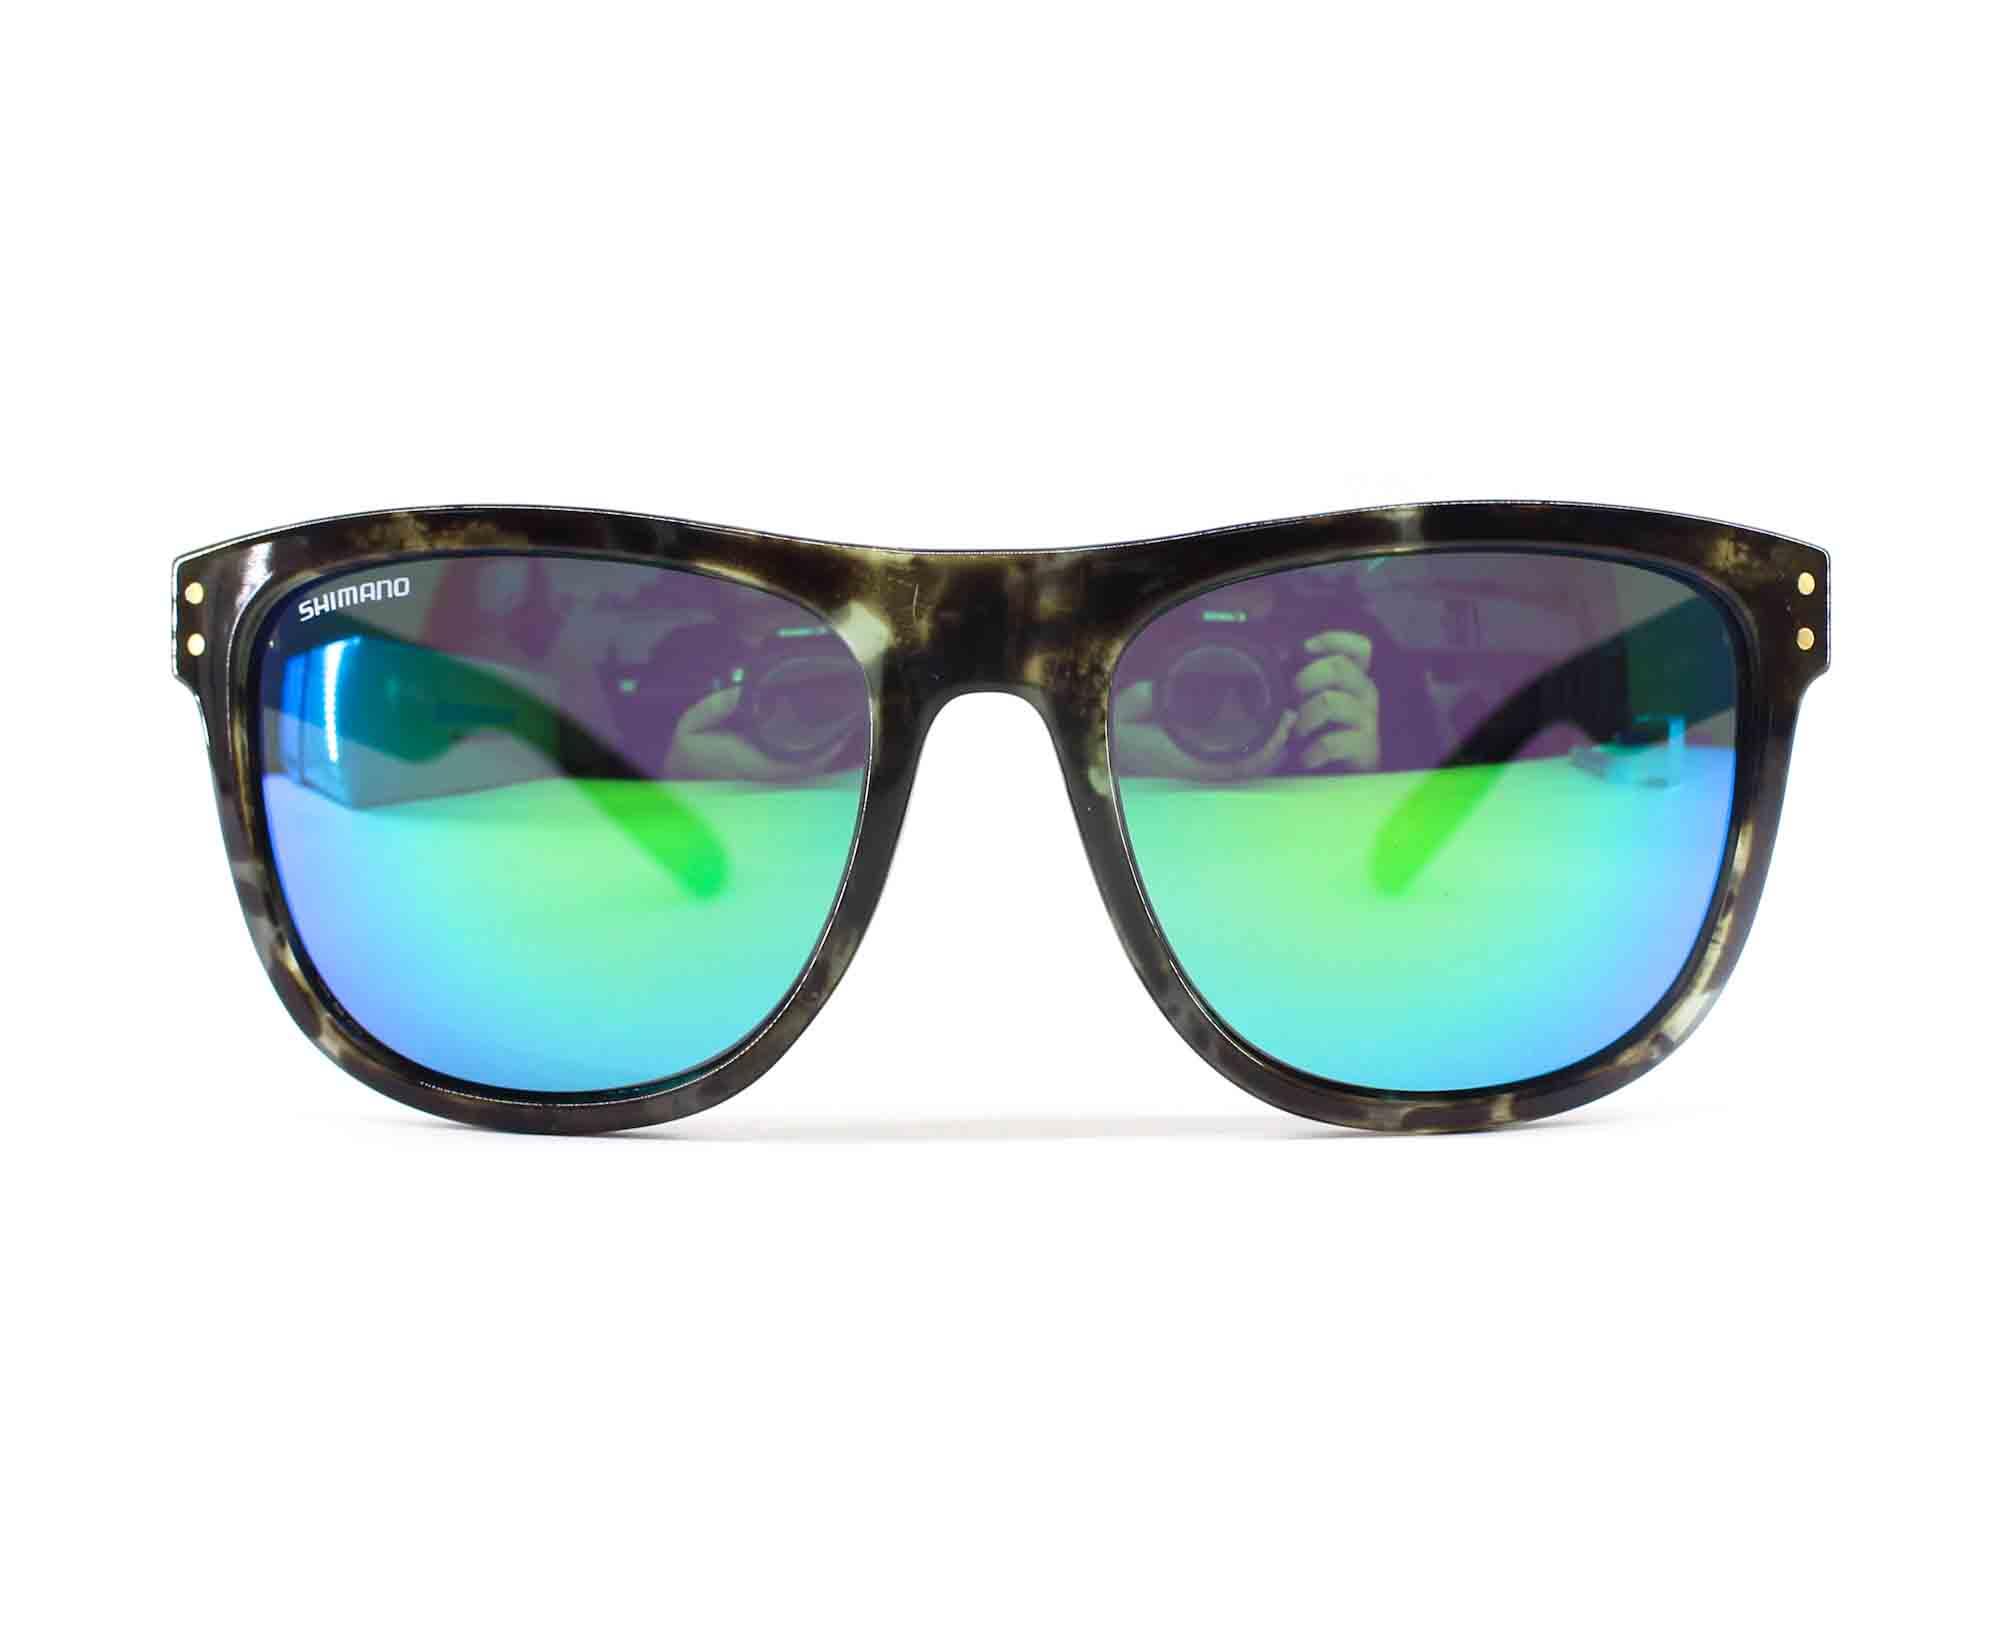 Shimano SUNBASS Sunglasses Polarised Bassterra (2264)